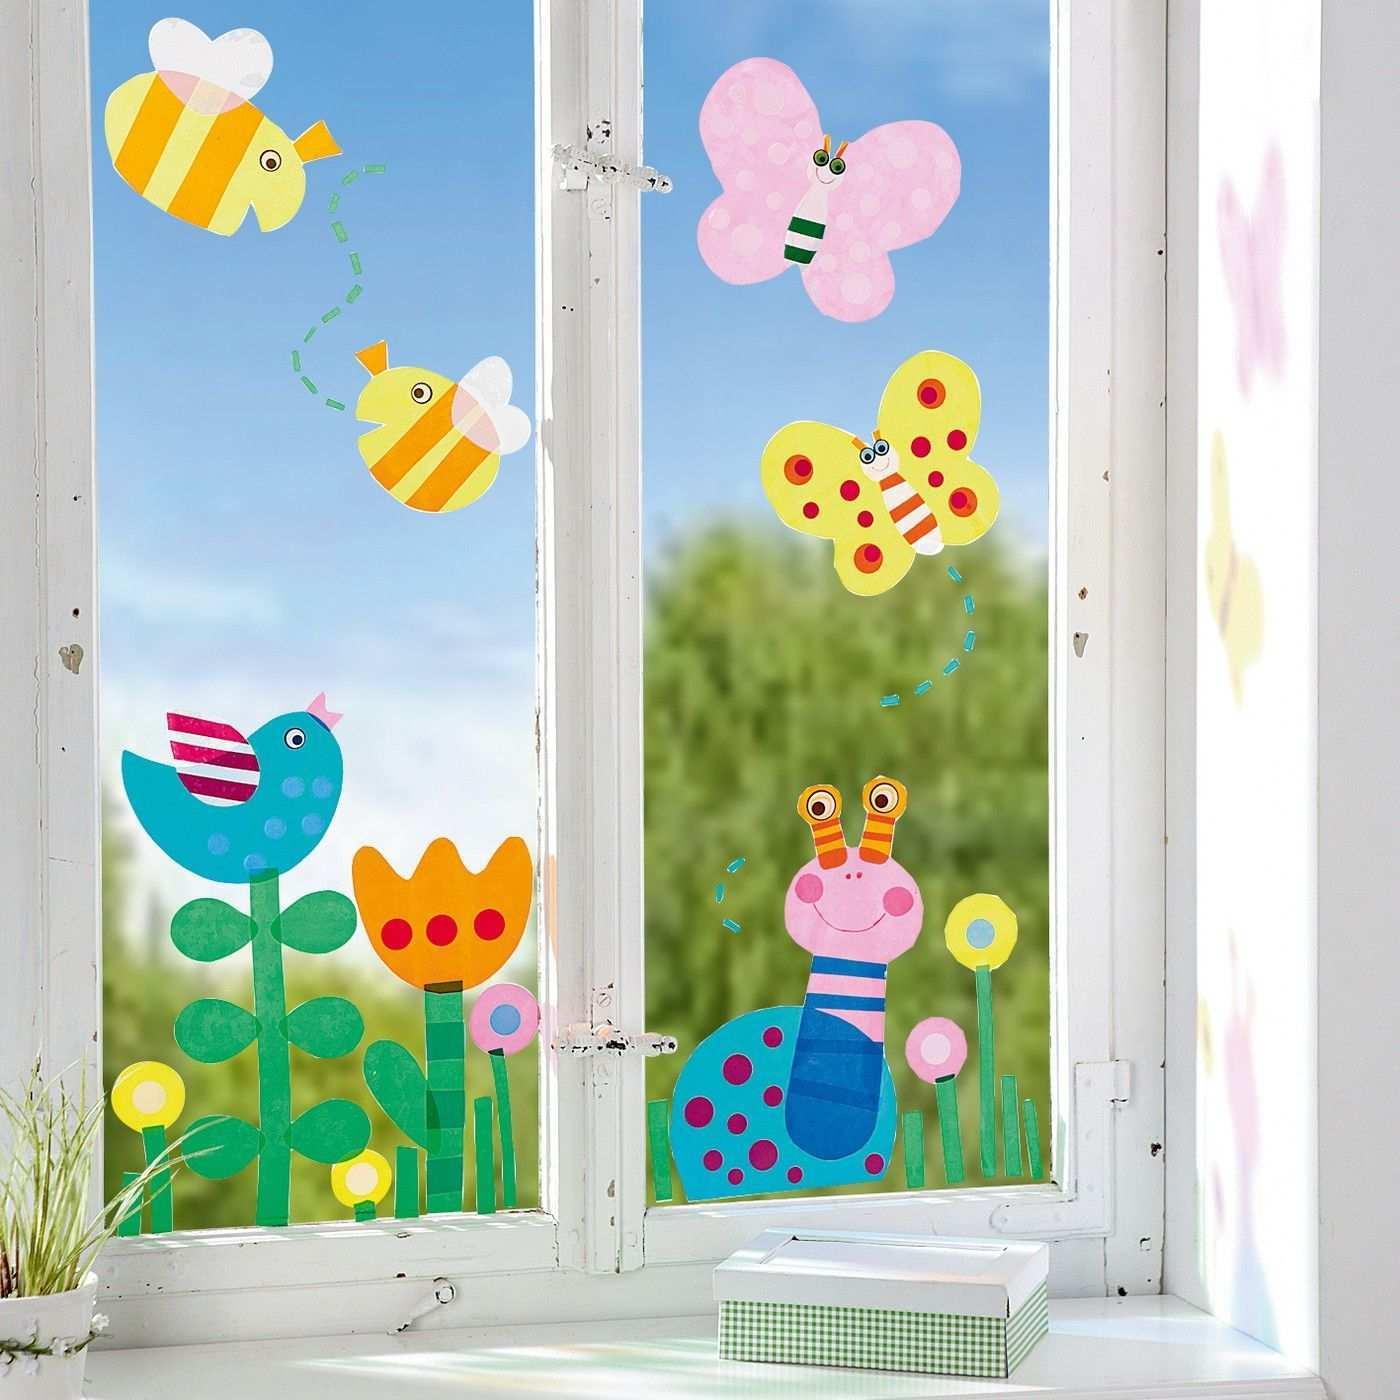 Fensterfolie Fruhling Jako O Jako O Basteln Fruhling Kinder Basteln Fruhling Kindergarten Basteln Fruhling Fensterdeko